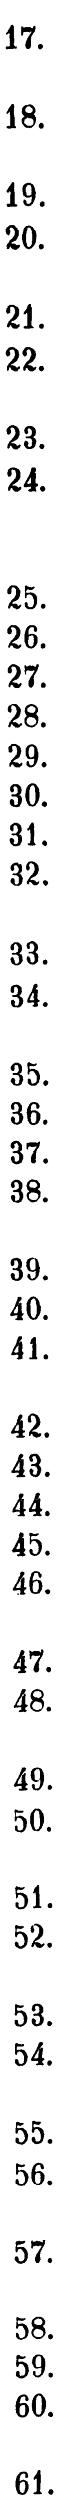 [merged small][merged small][merged small][merged small][merged small][merged small][merged small][ocr errors][ocr errors][merged small][merged small][merged small][merged small][merged small][merged small][merged small][merged small]